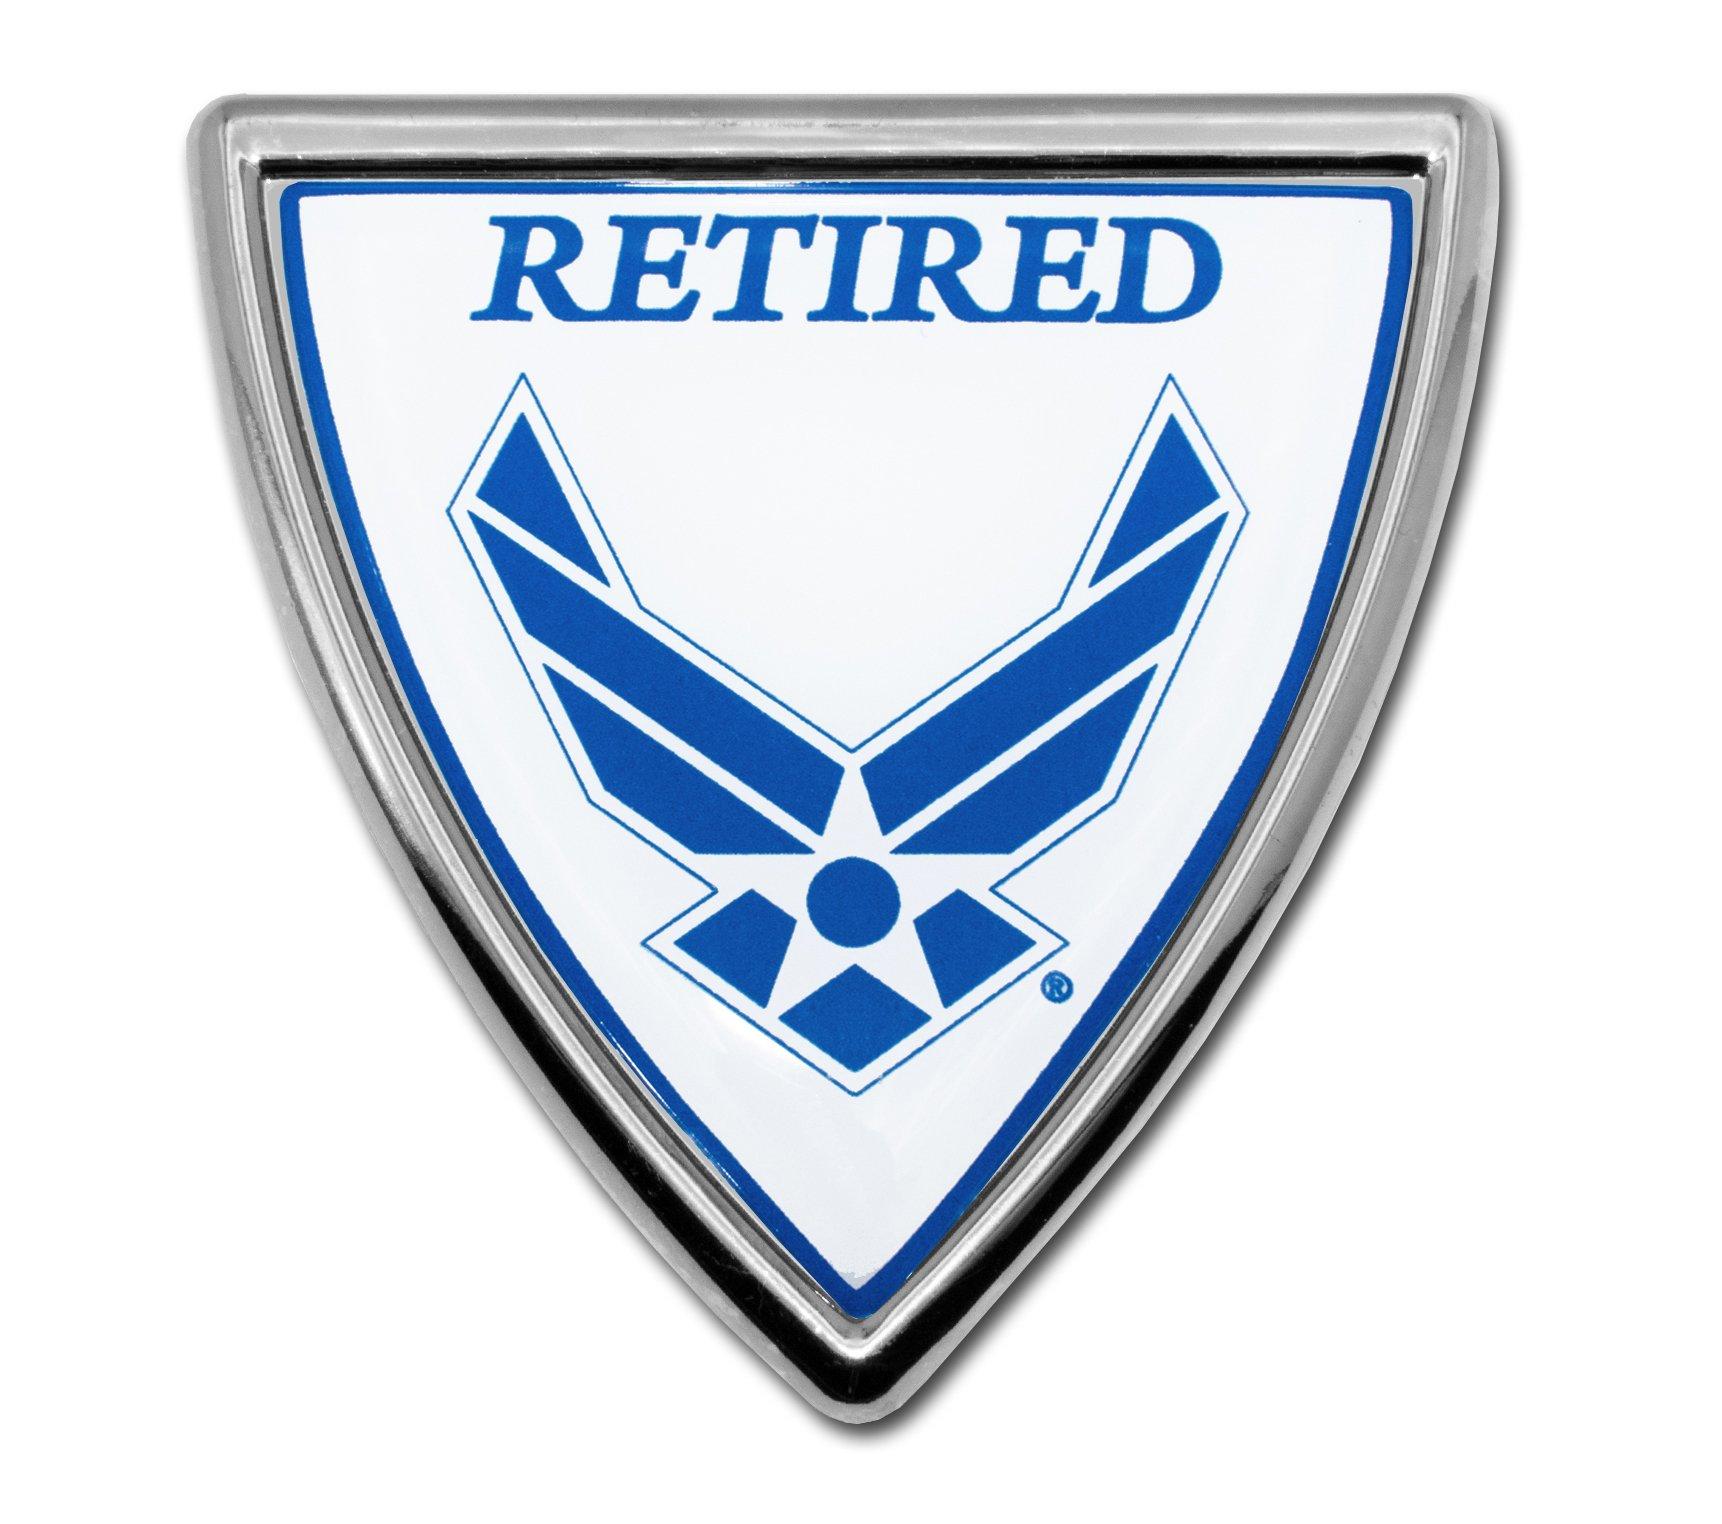 Elektroplate Air Force Retired Shield Chrome Auto Emblem by Elektroplate